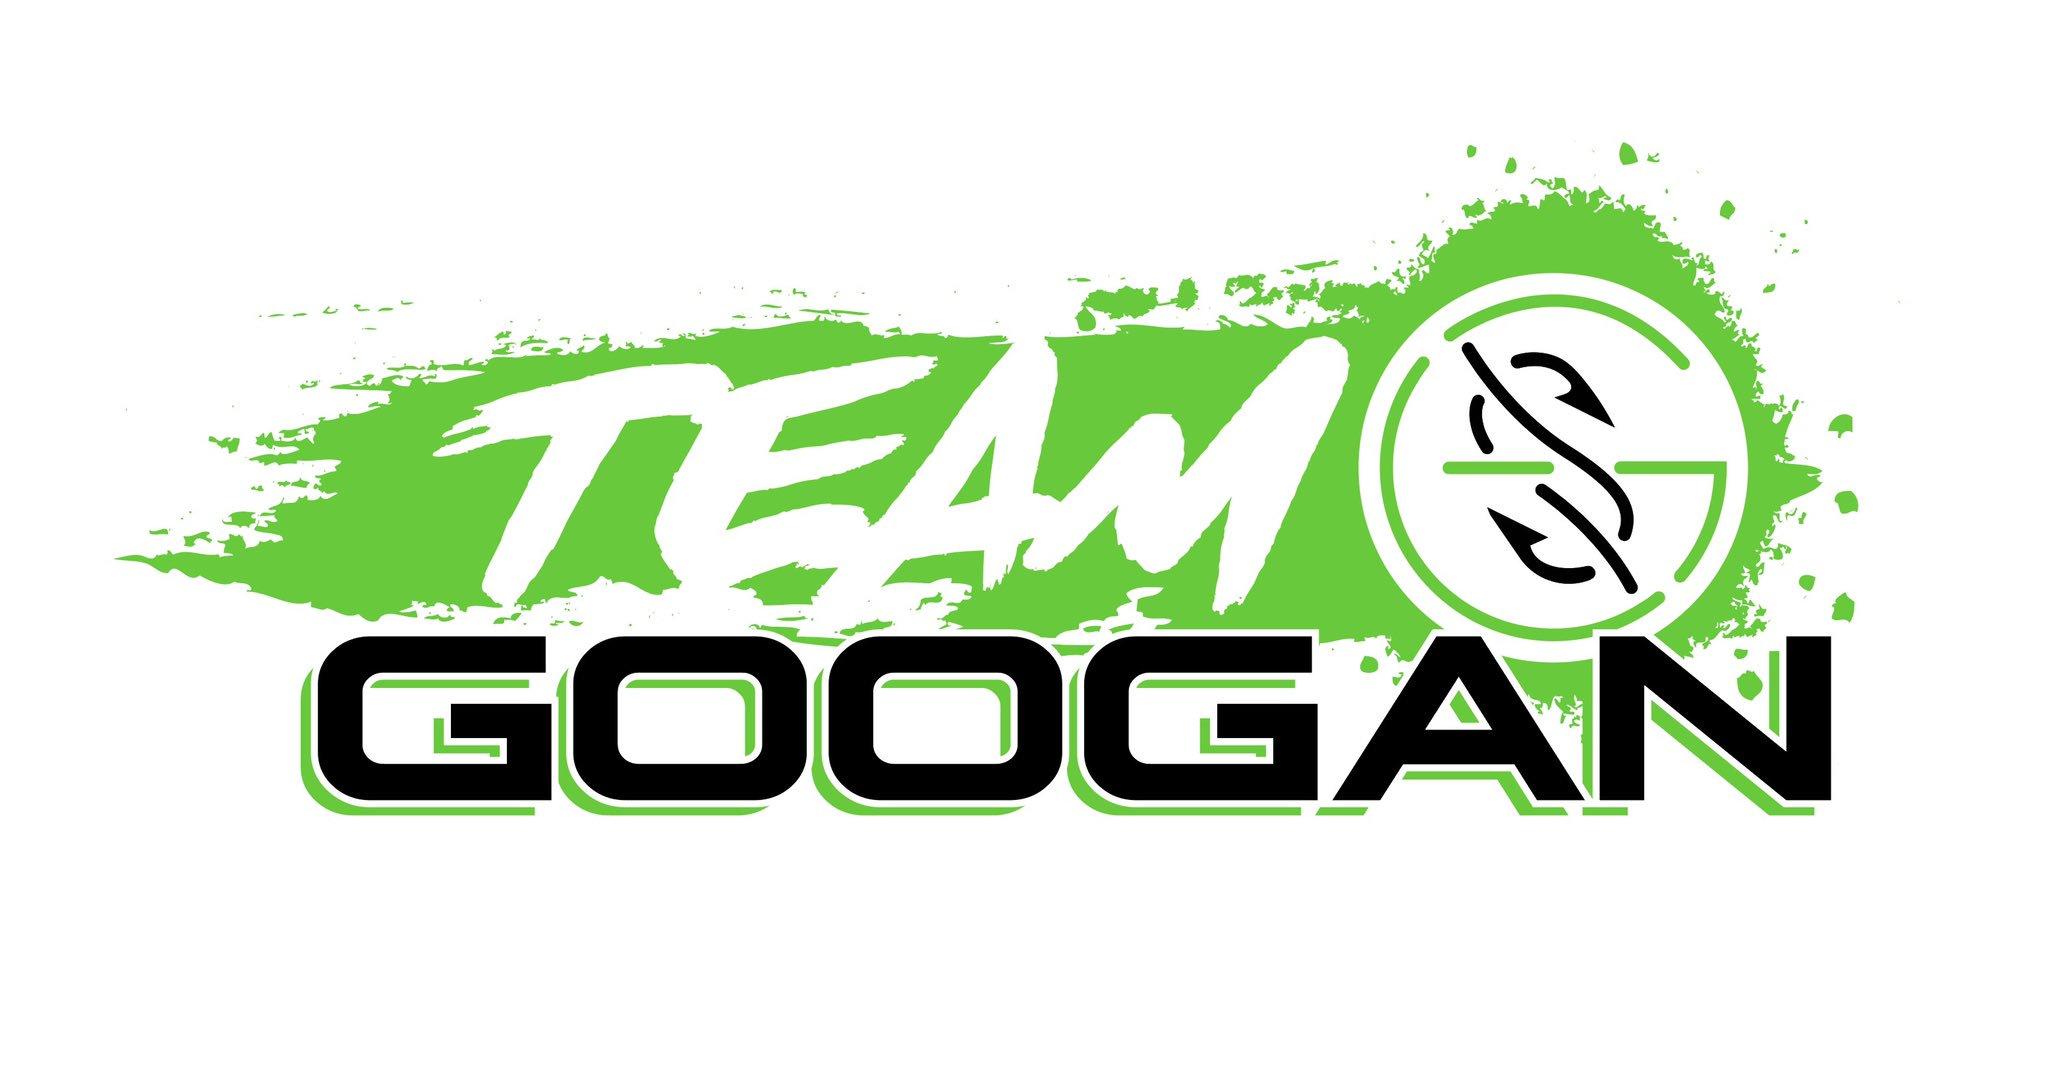 88ed126e11c14 Googan Squad on Twitter